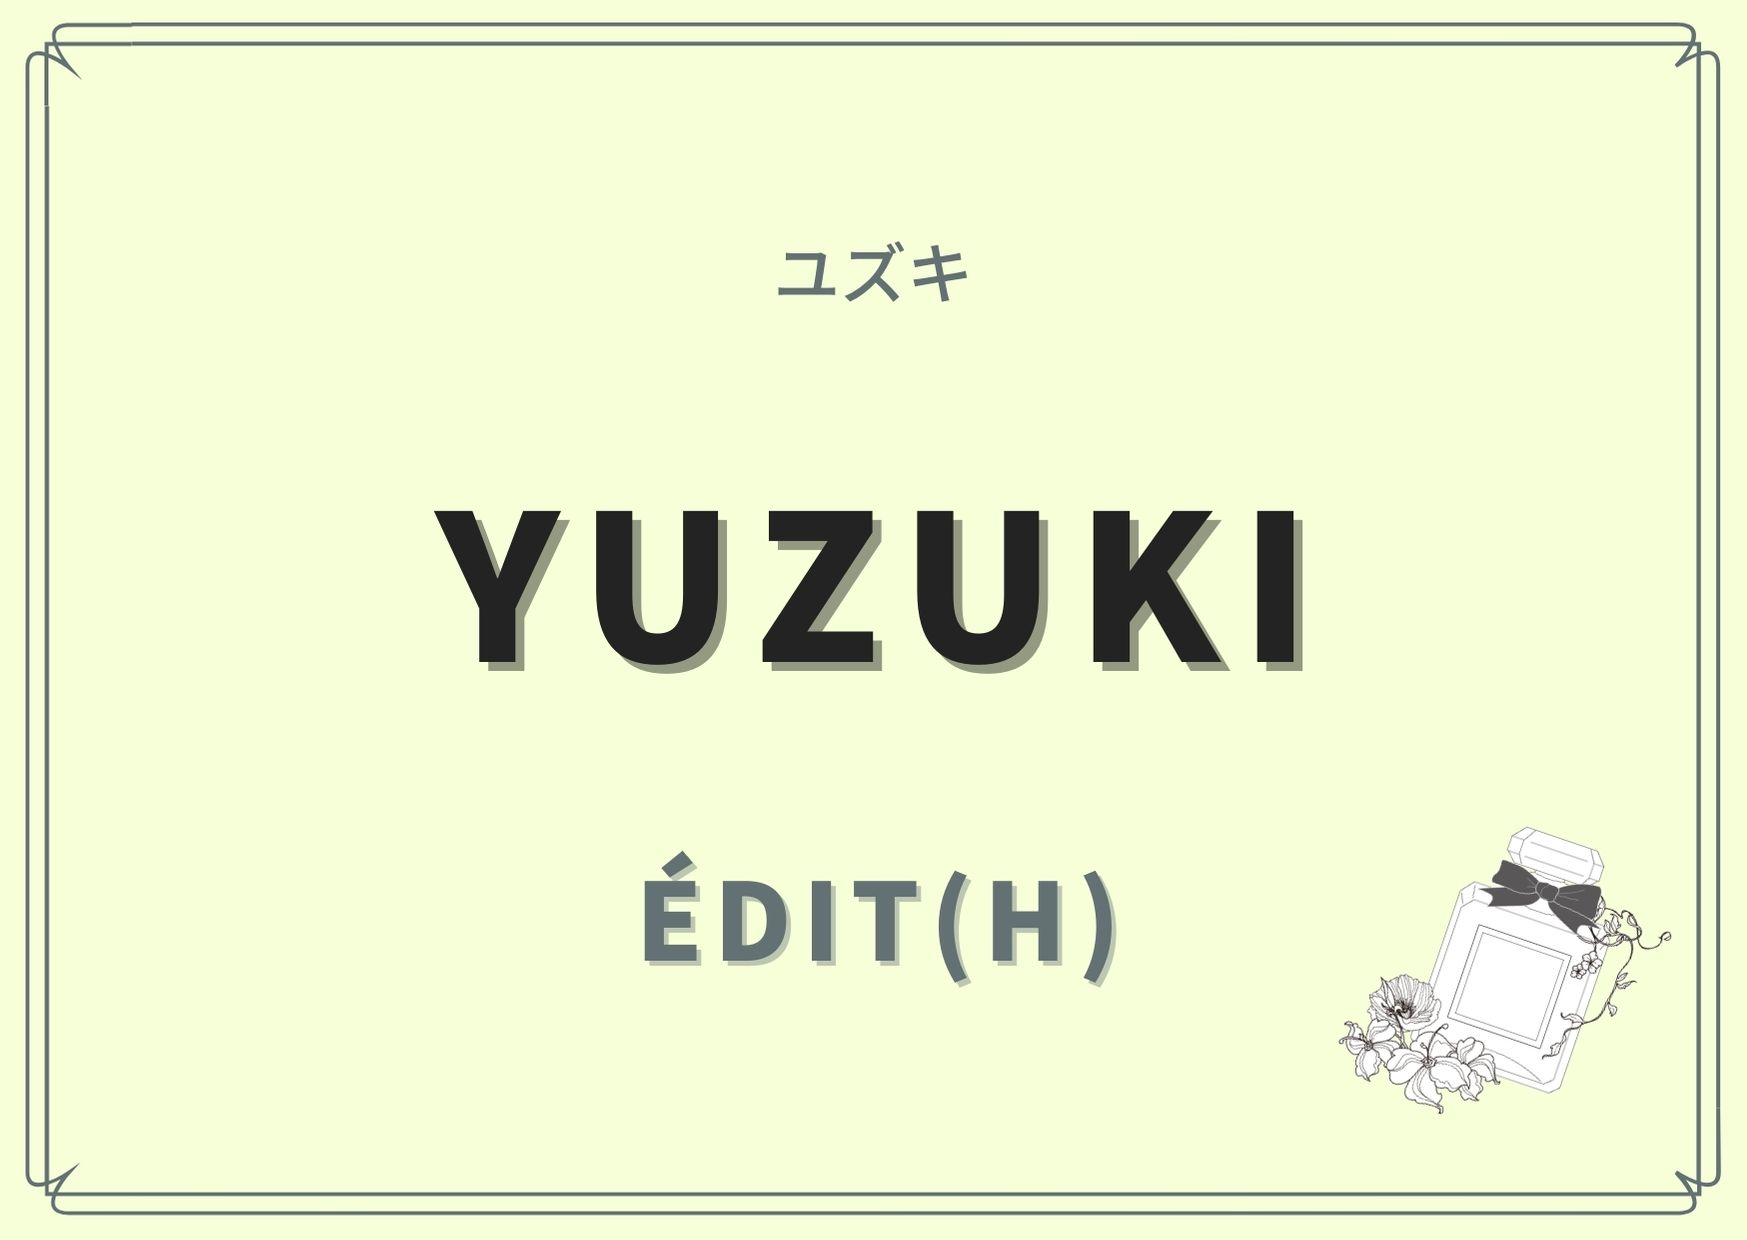 Yuzuki(ユズキ)/ÉDIT(h)(エディット)